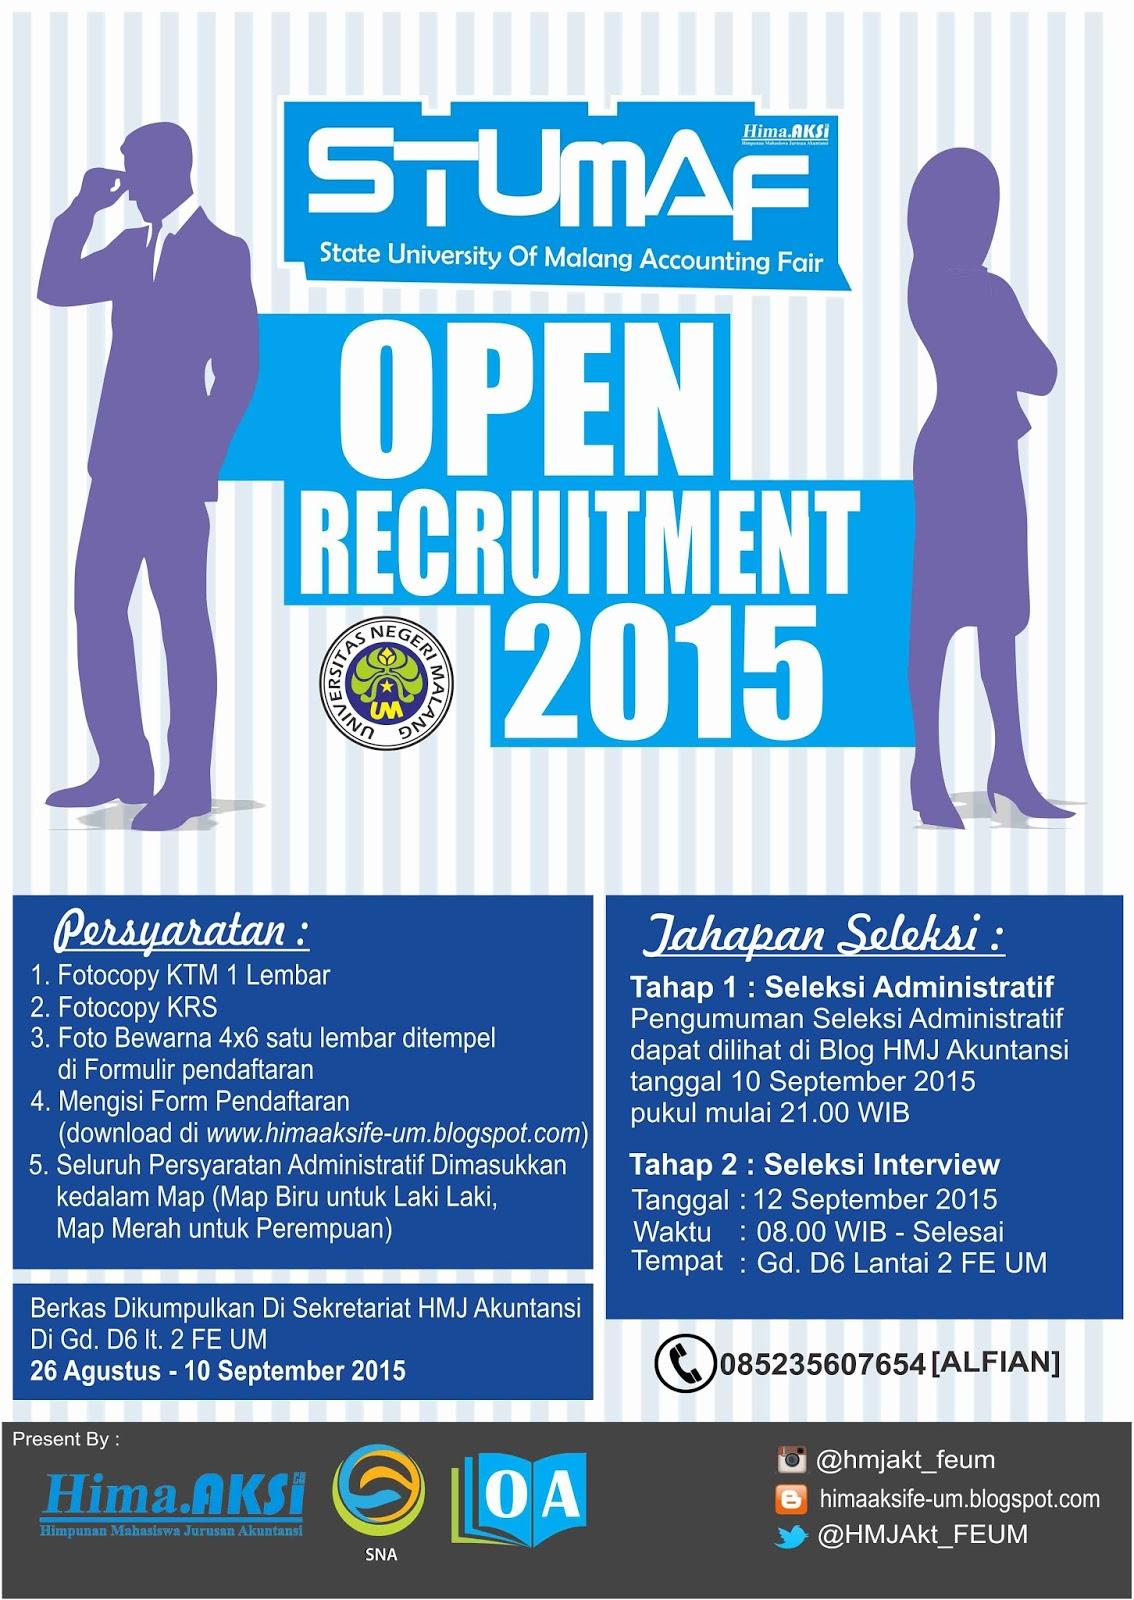 Open Recruitment Panitia Stumaf State University Accounting Fair